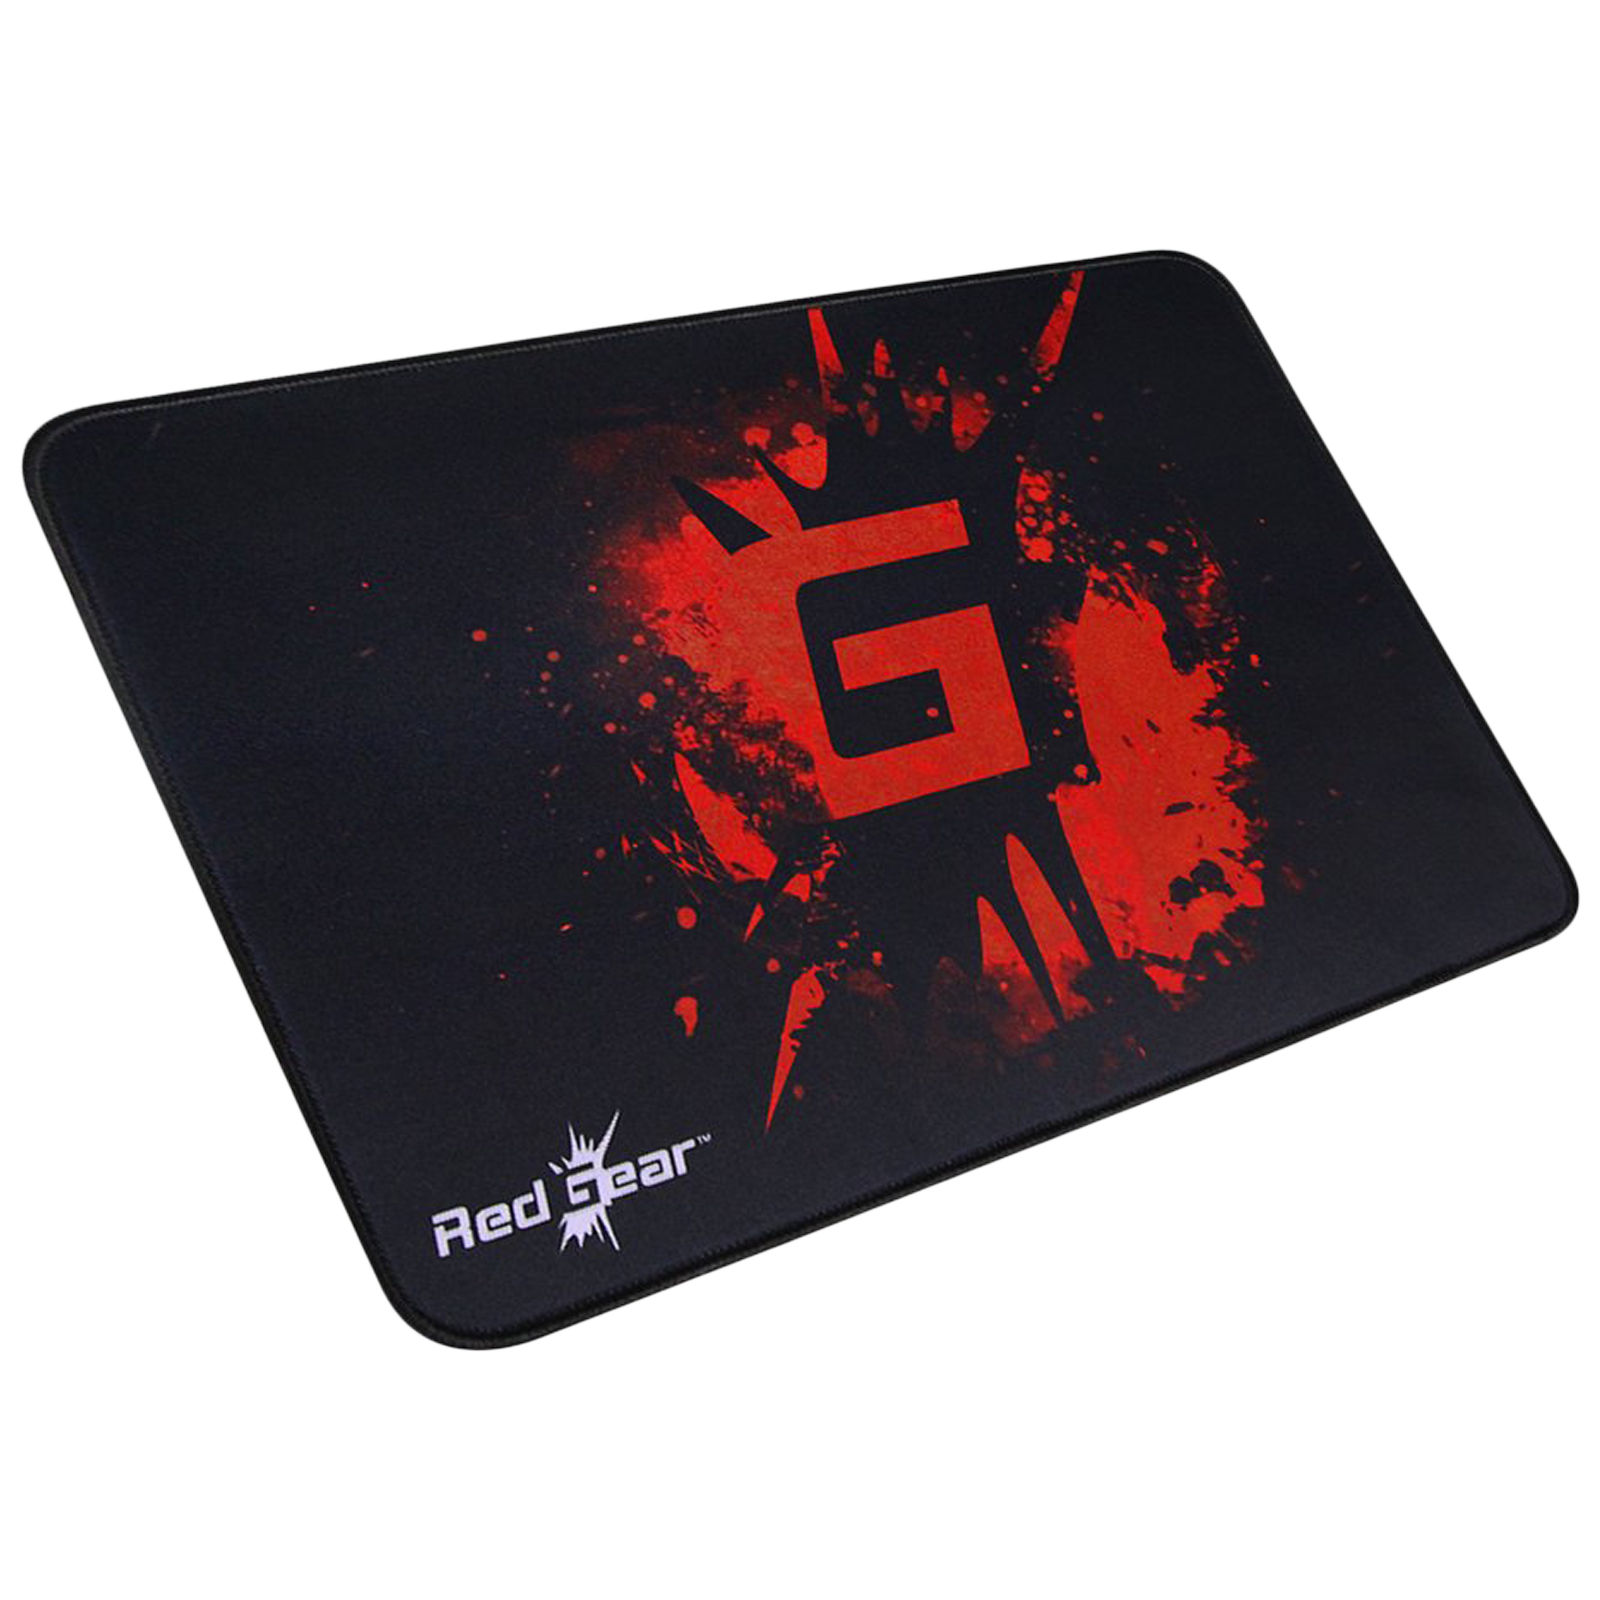 Redgear Gaming Mouse Pad (Sensor Responsive Coating, MP35, Black)_1